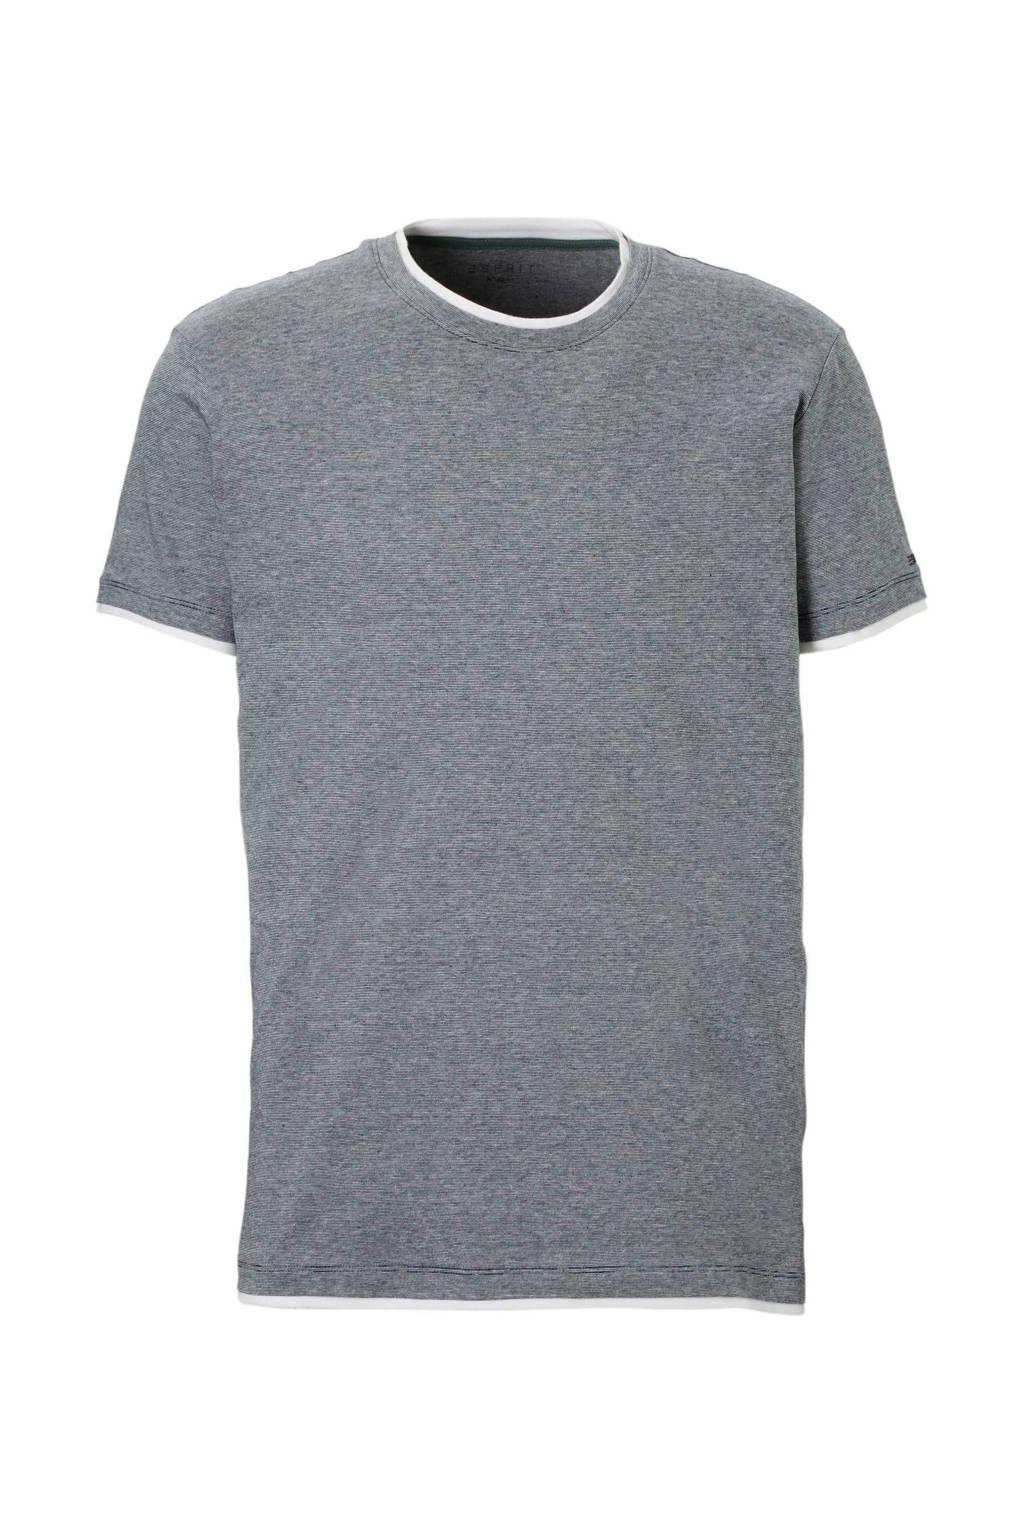 ESPRIT Men Casual T-shirt, Grijs melange